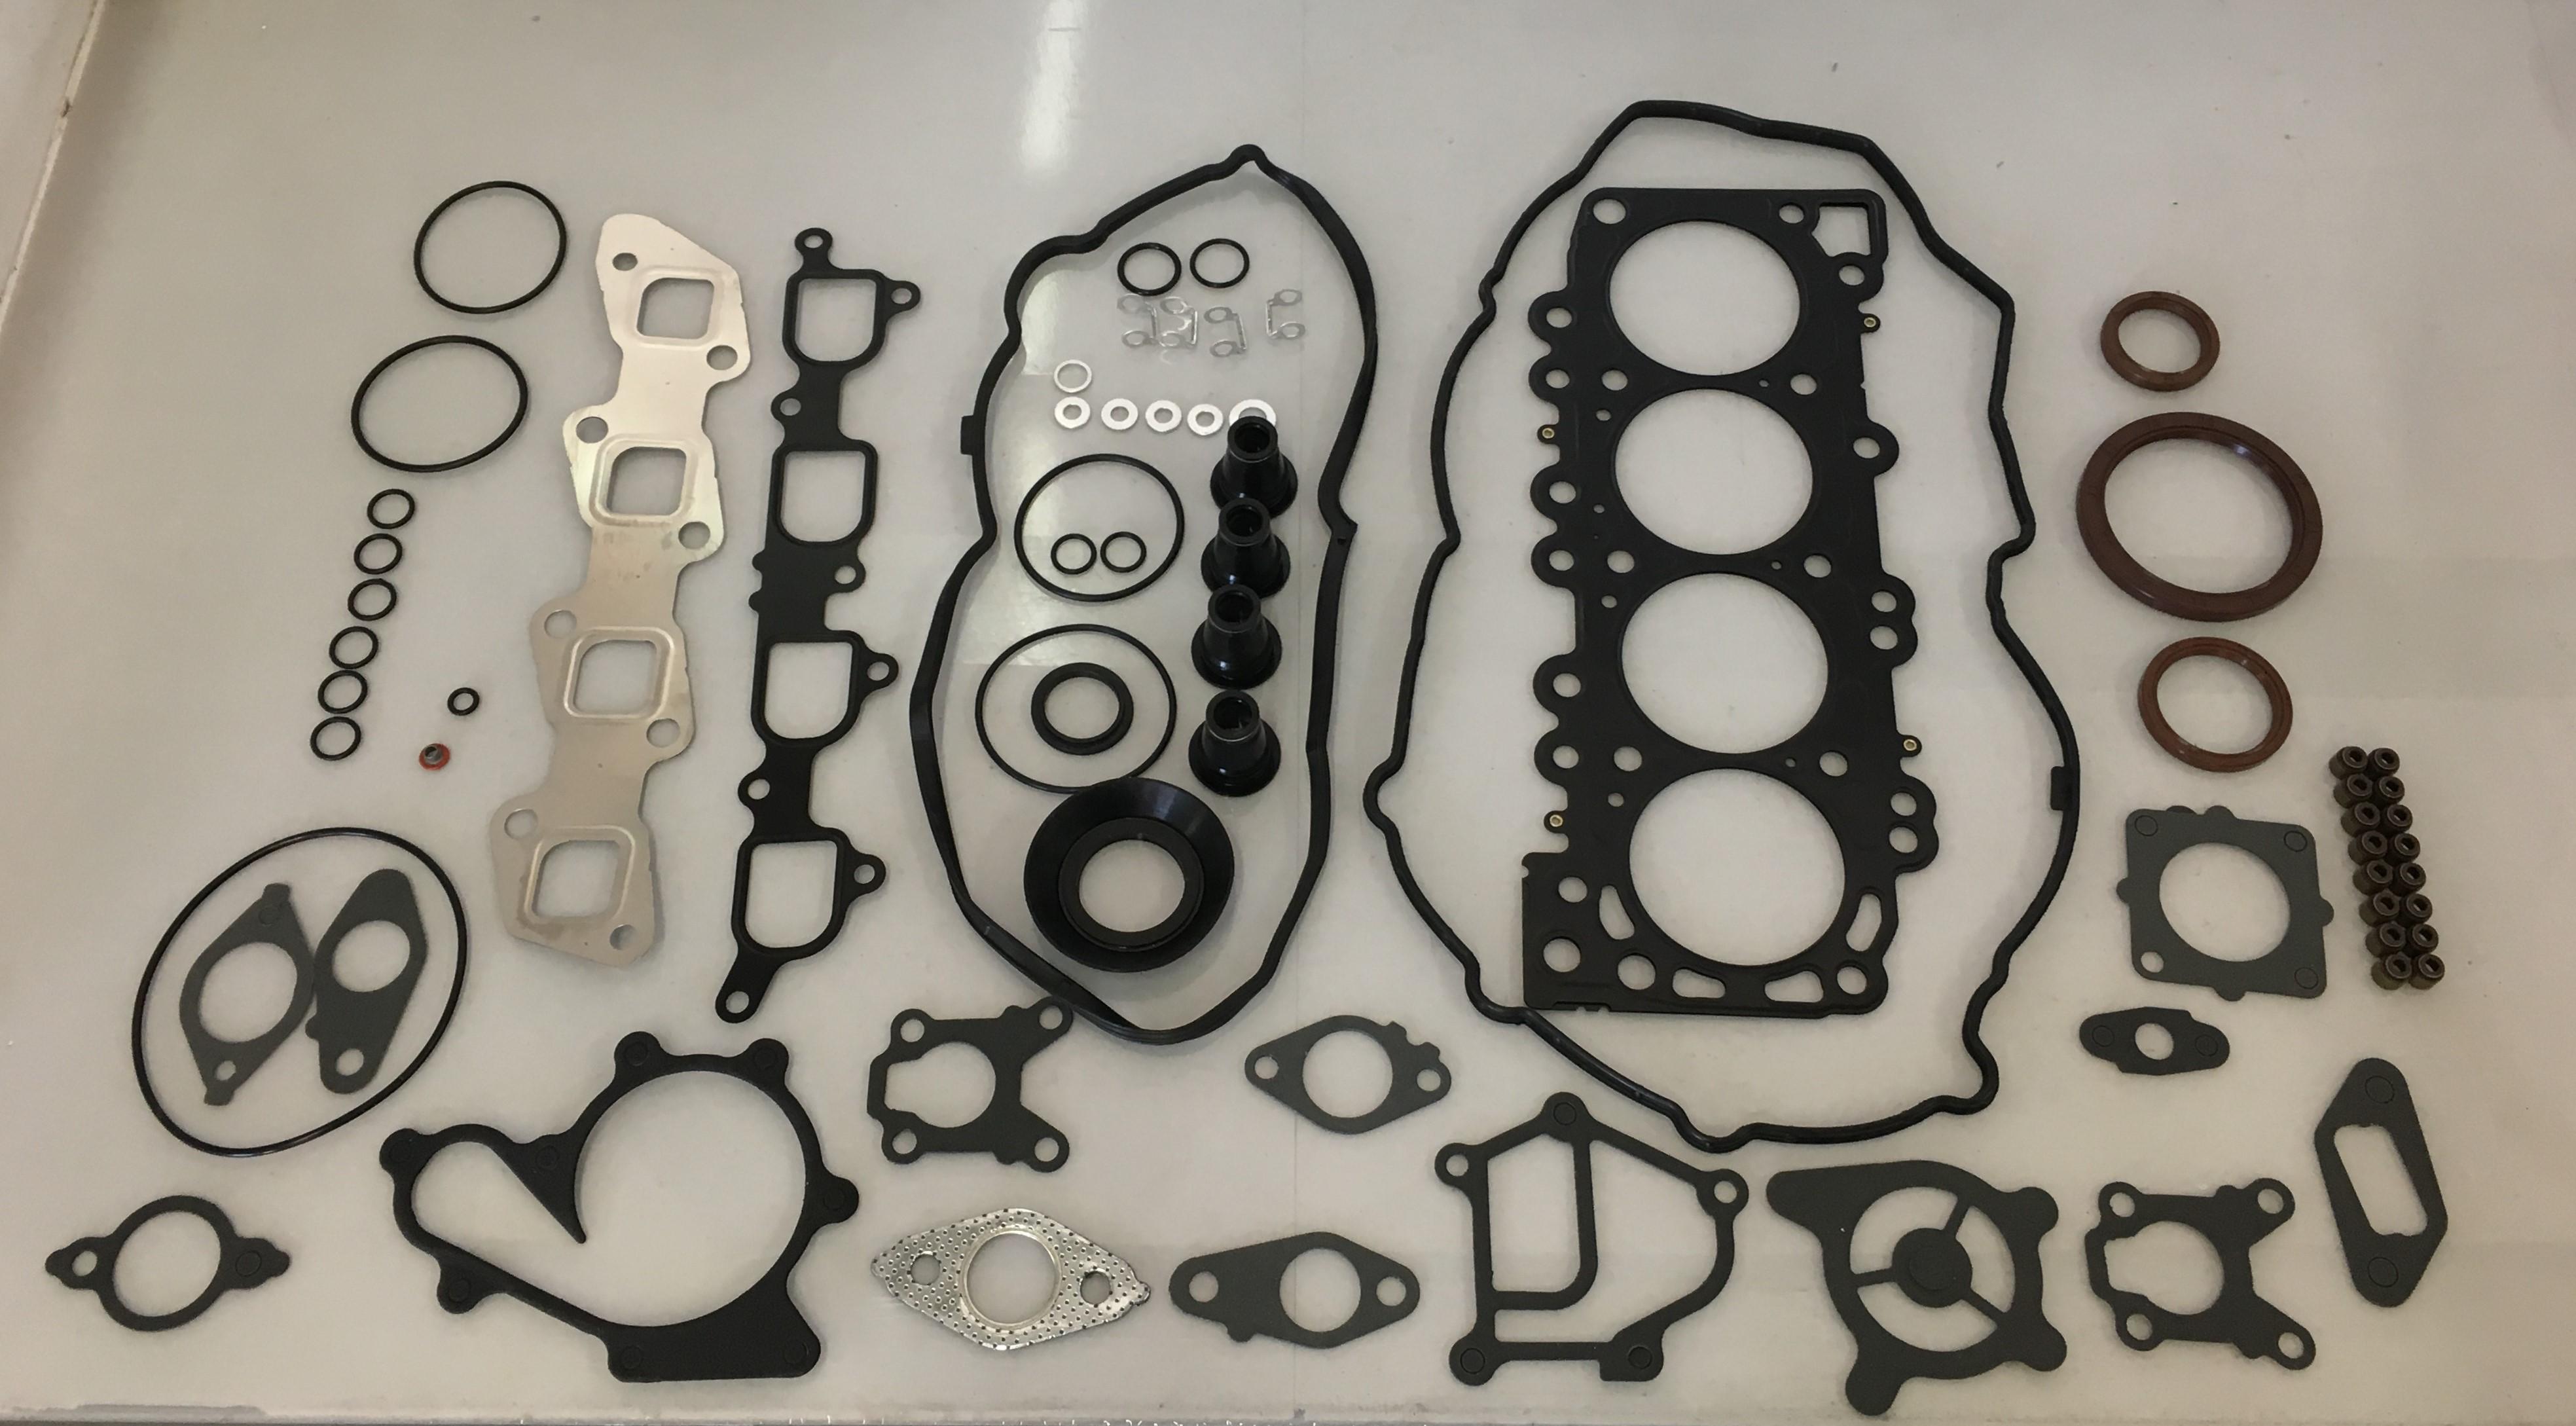 Dichtungssatz Zylinderkopfdichtung Nissan NP300 2,5 dCi YD25DDTi 11044-VK500 NEU